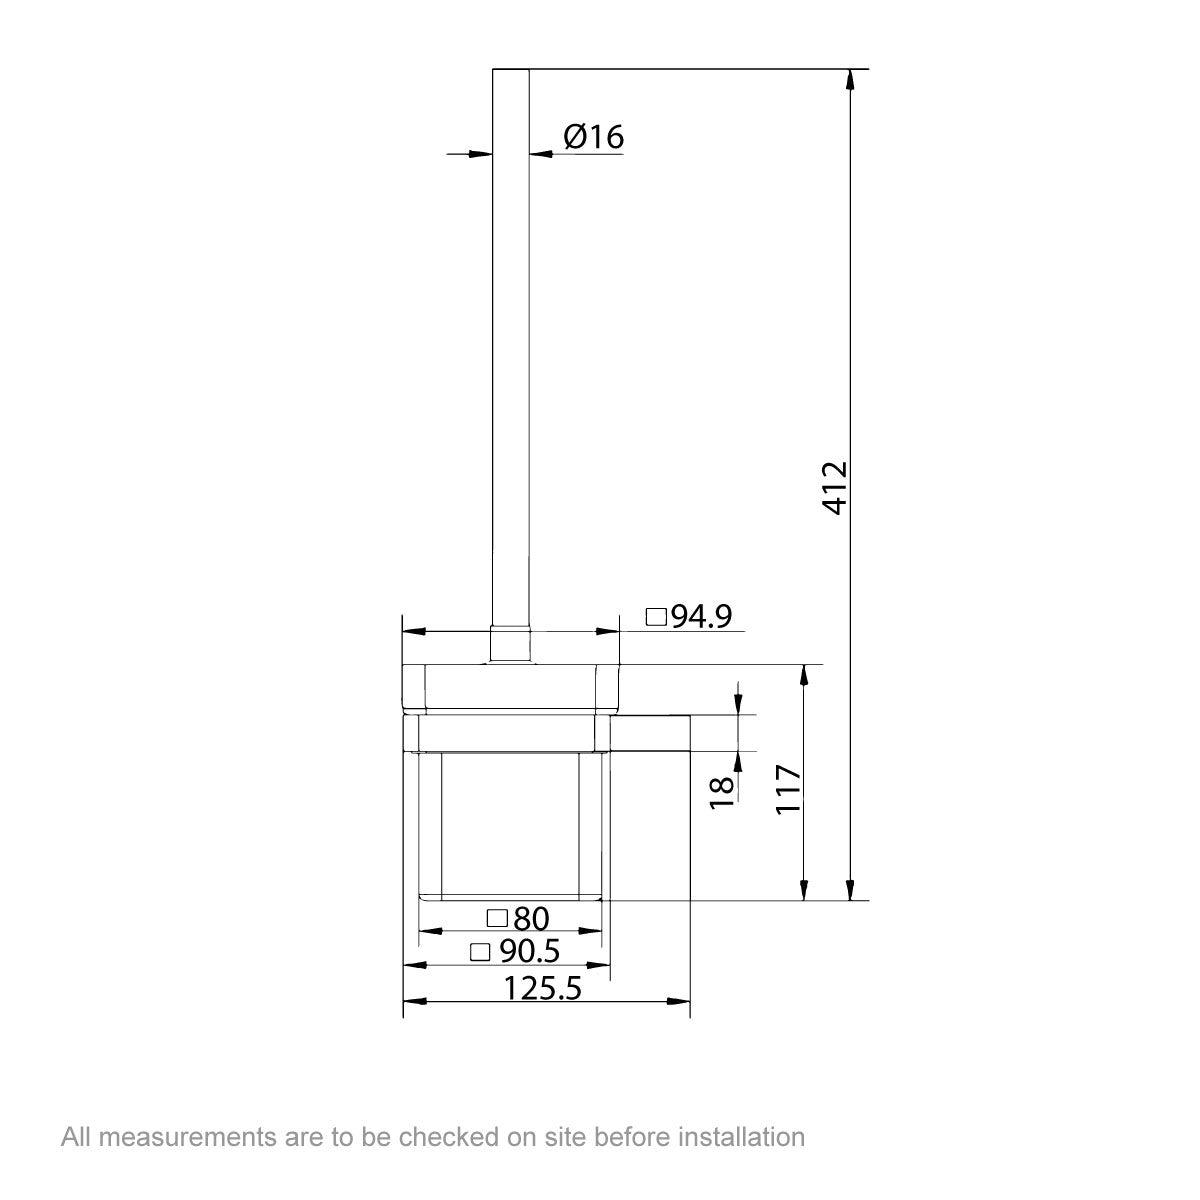 Dimensions for Mode Spencer rose gold toilet brush and holder